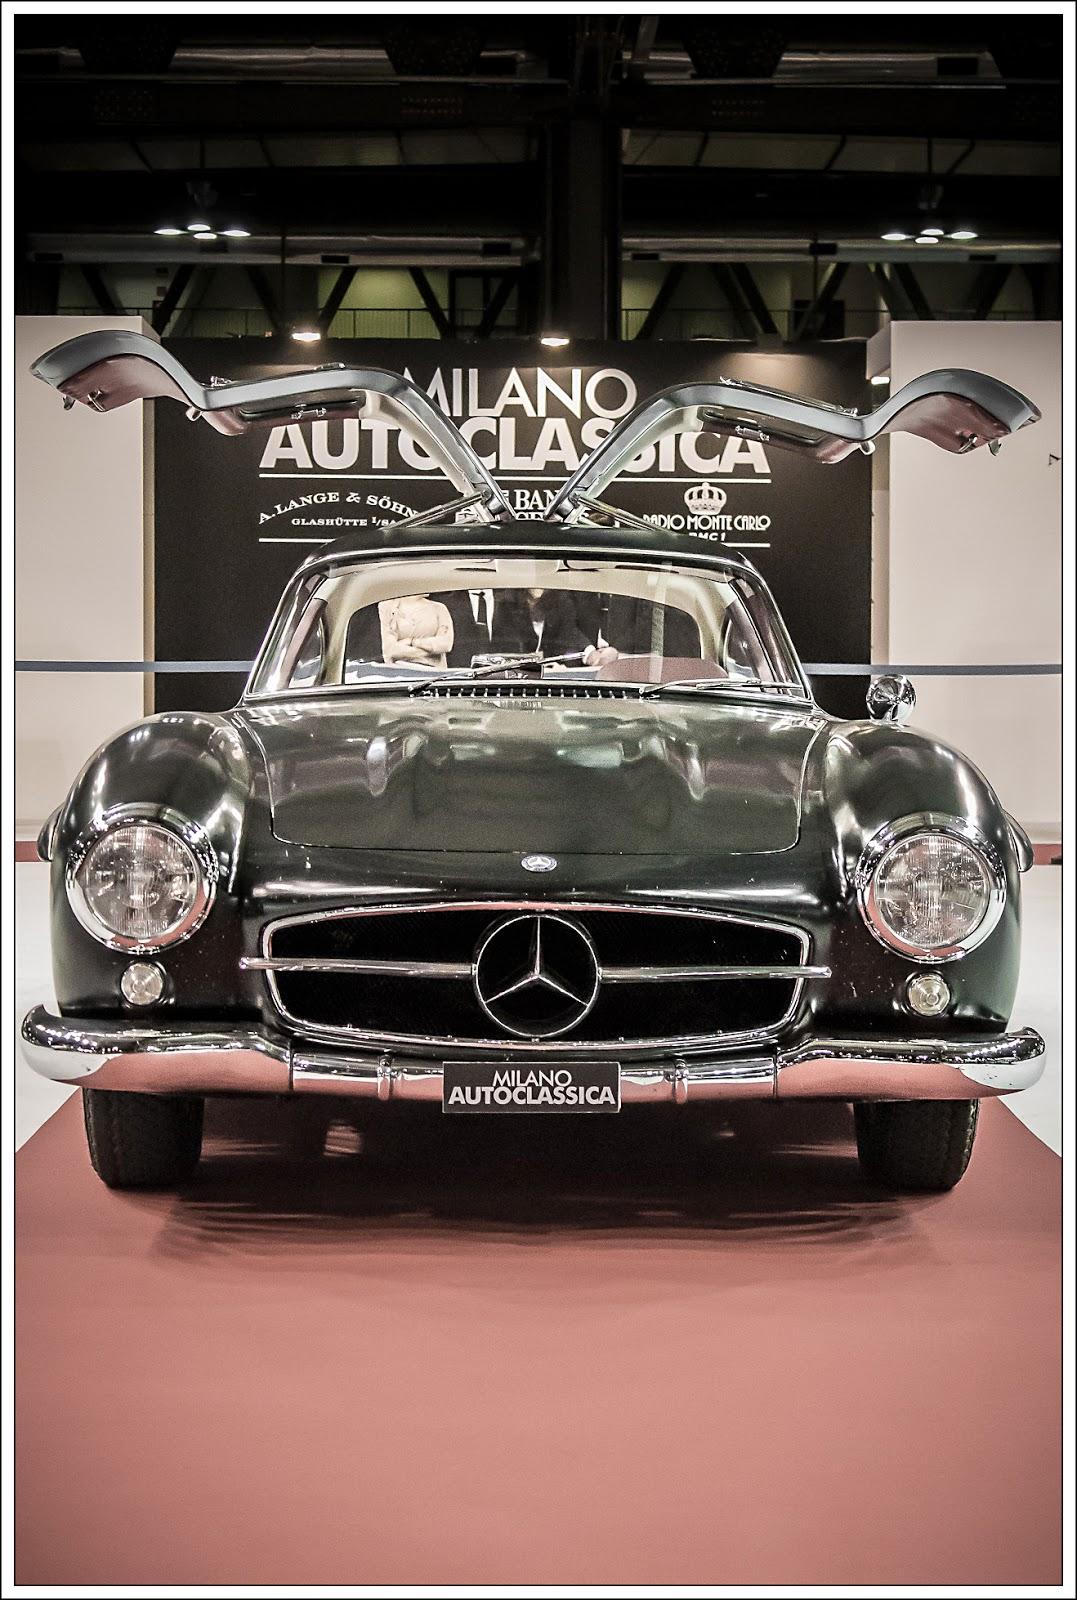 Milano AutoClassica 2014